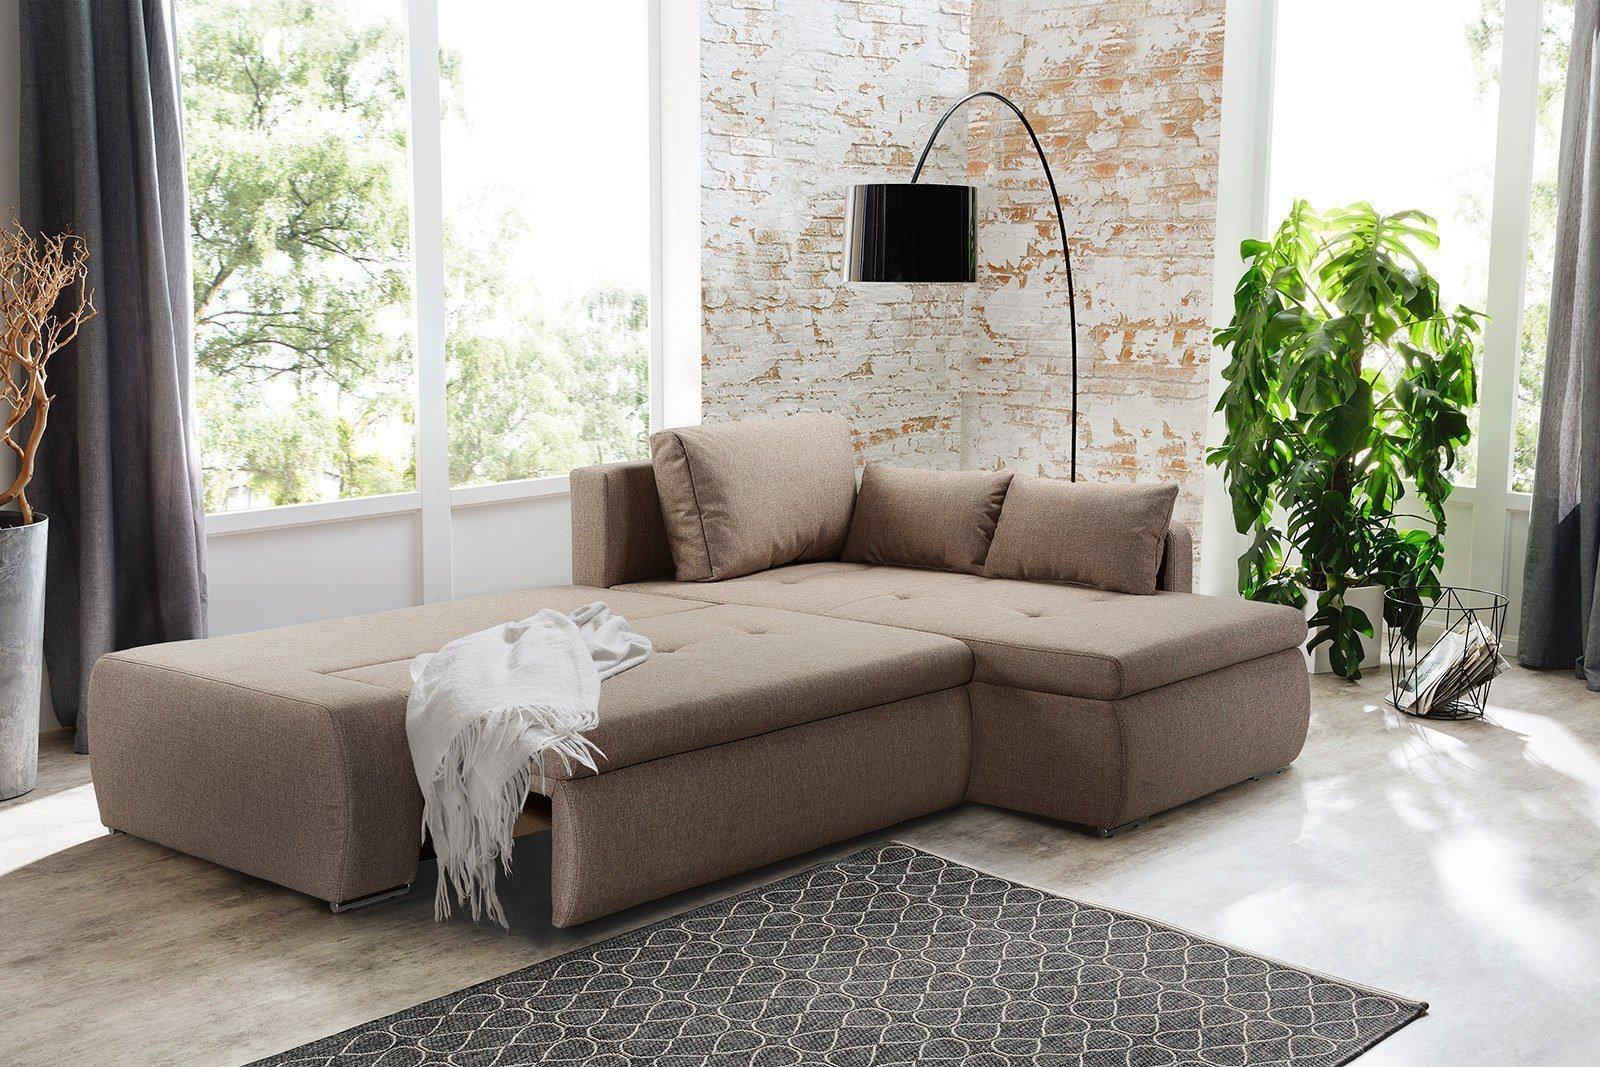 jockenh fer amberg ecksofa braun m bel letz ihr online shop. Black Bedroom Furniture Sets. Home Design Ideas